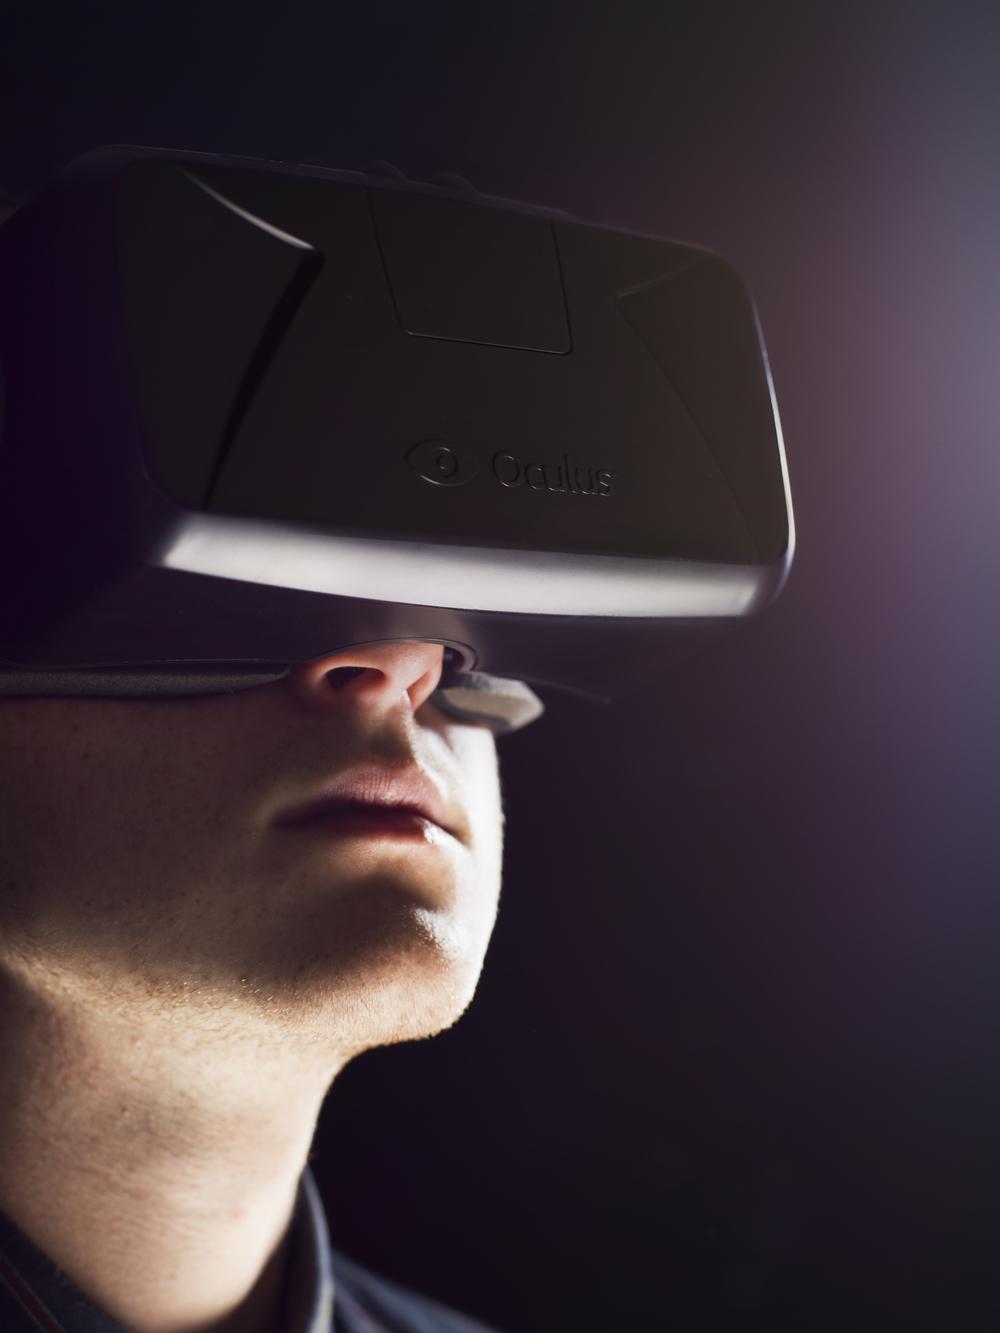 15-03-2016_Oculus1_0129export.jpg